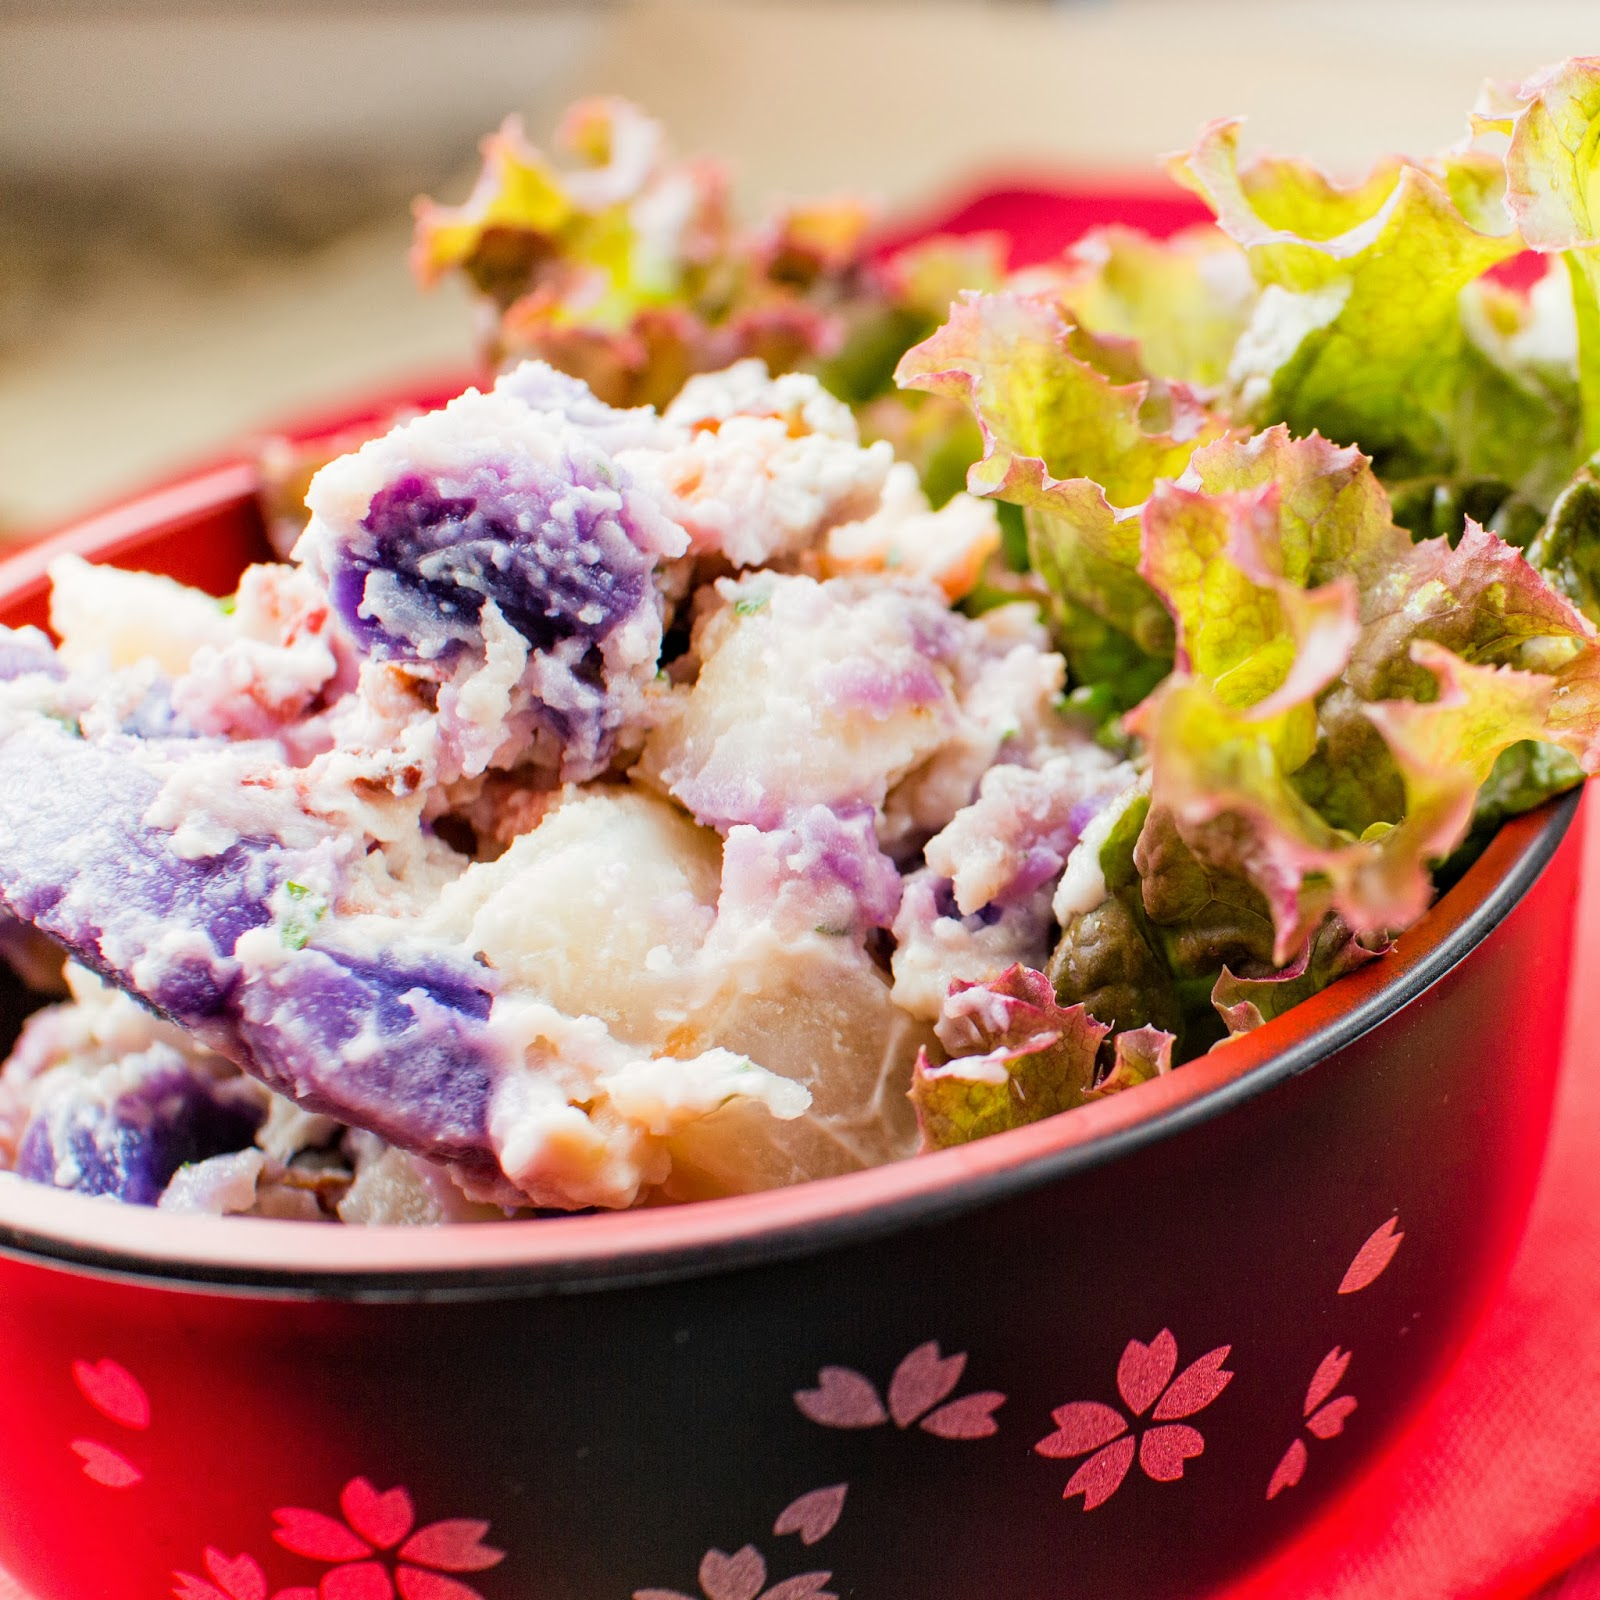 kruizing with kikukat: Pastel Purple Potato Salad